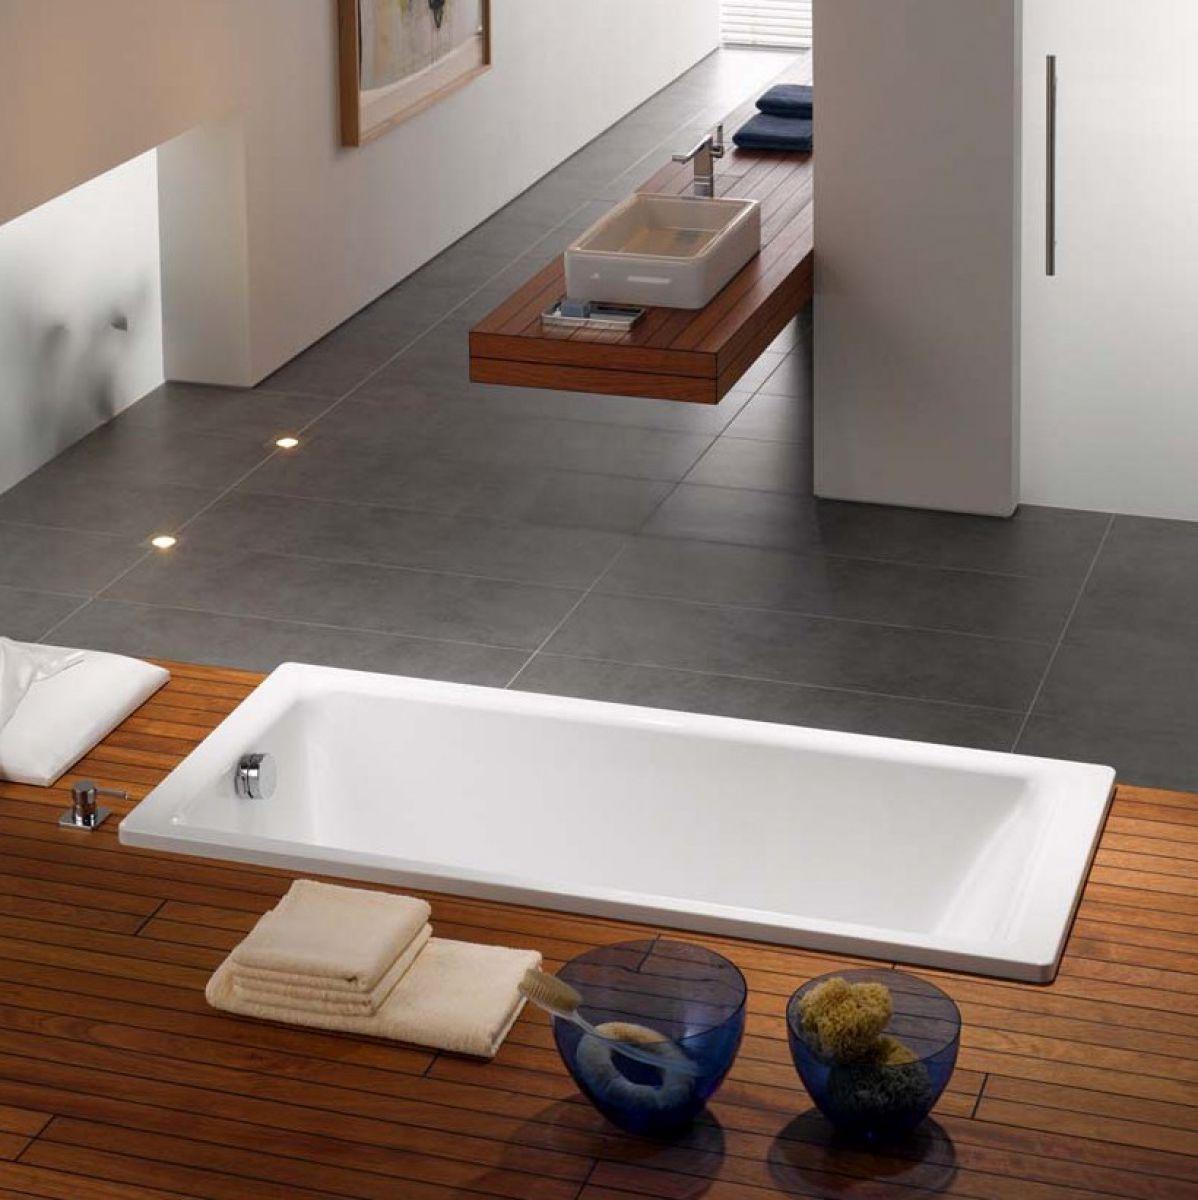 kaldewei puro single ended steel bath tub uk bathrooms. Black Bedroom Furniture Sets. Home Design Ideas